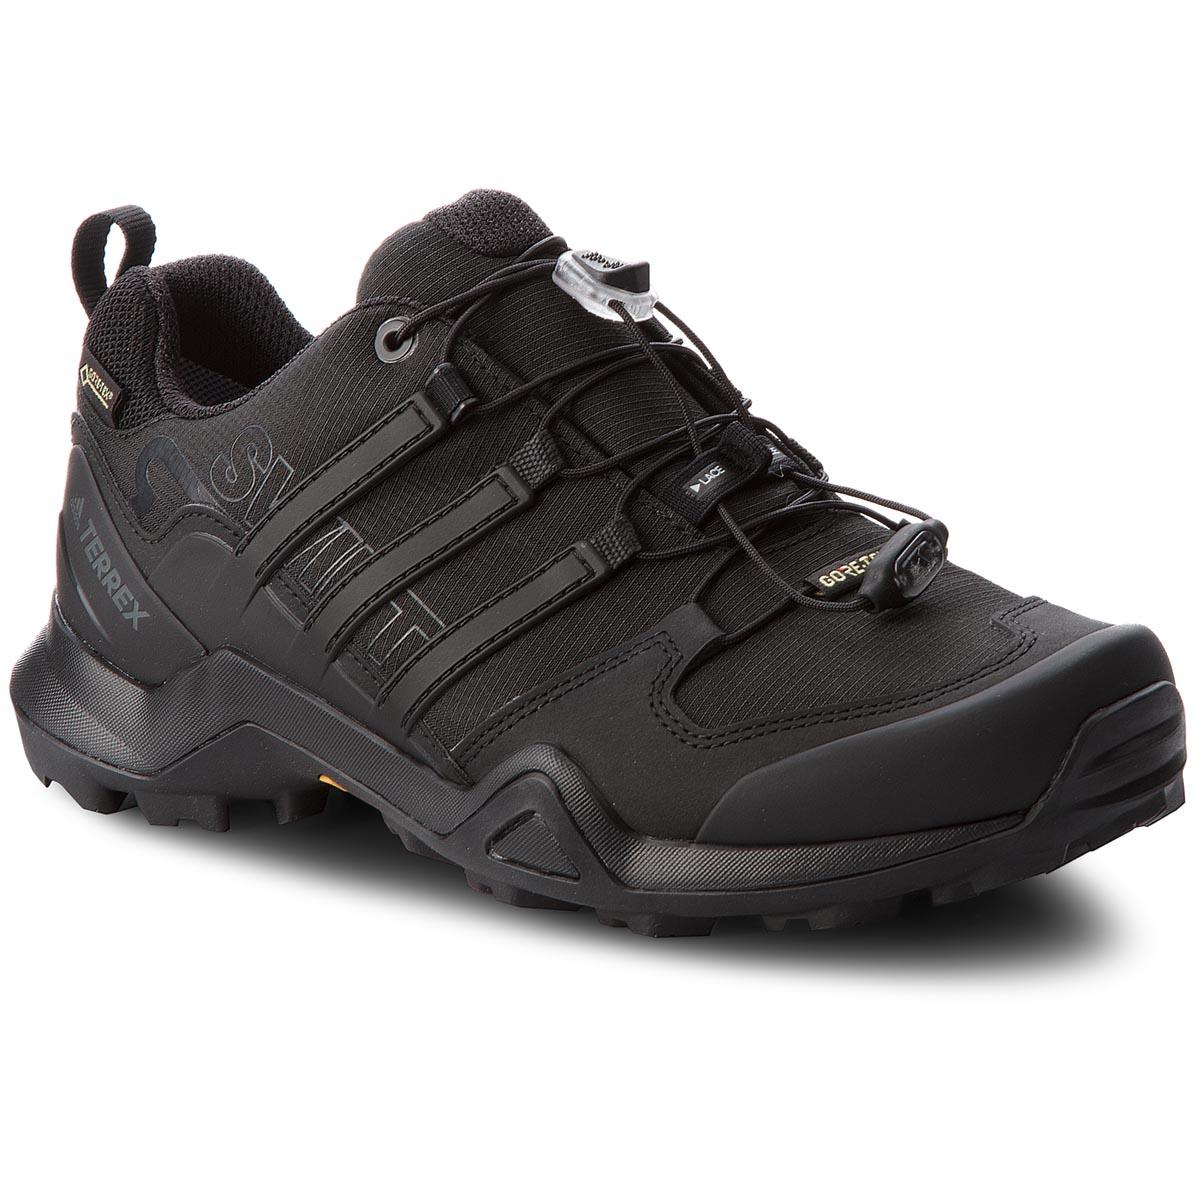 2161054175 Cipő adidas - Terrex Swift R2 Gtx GORE-TEX CM7492 Cblack/Cblack/Cblack